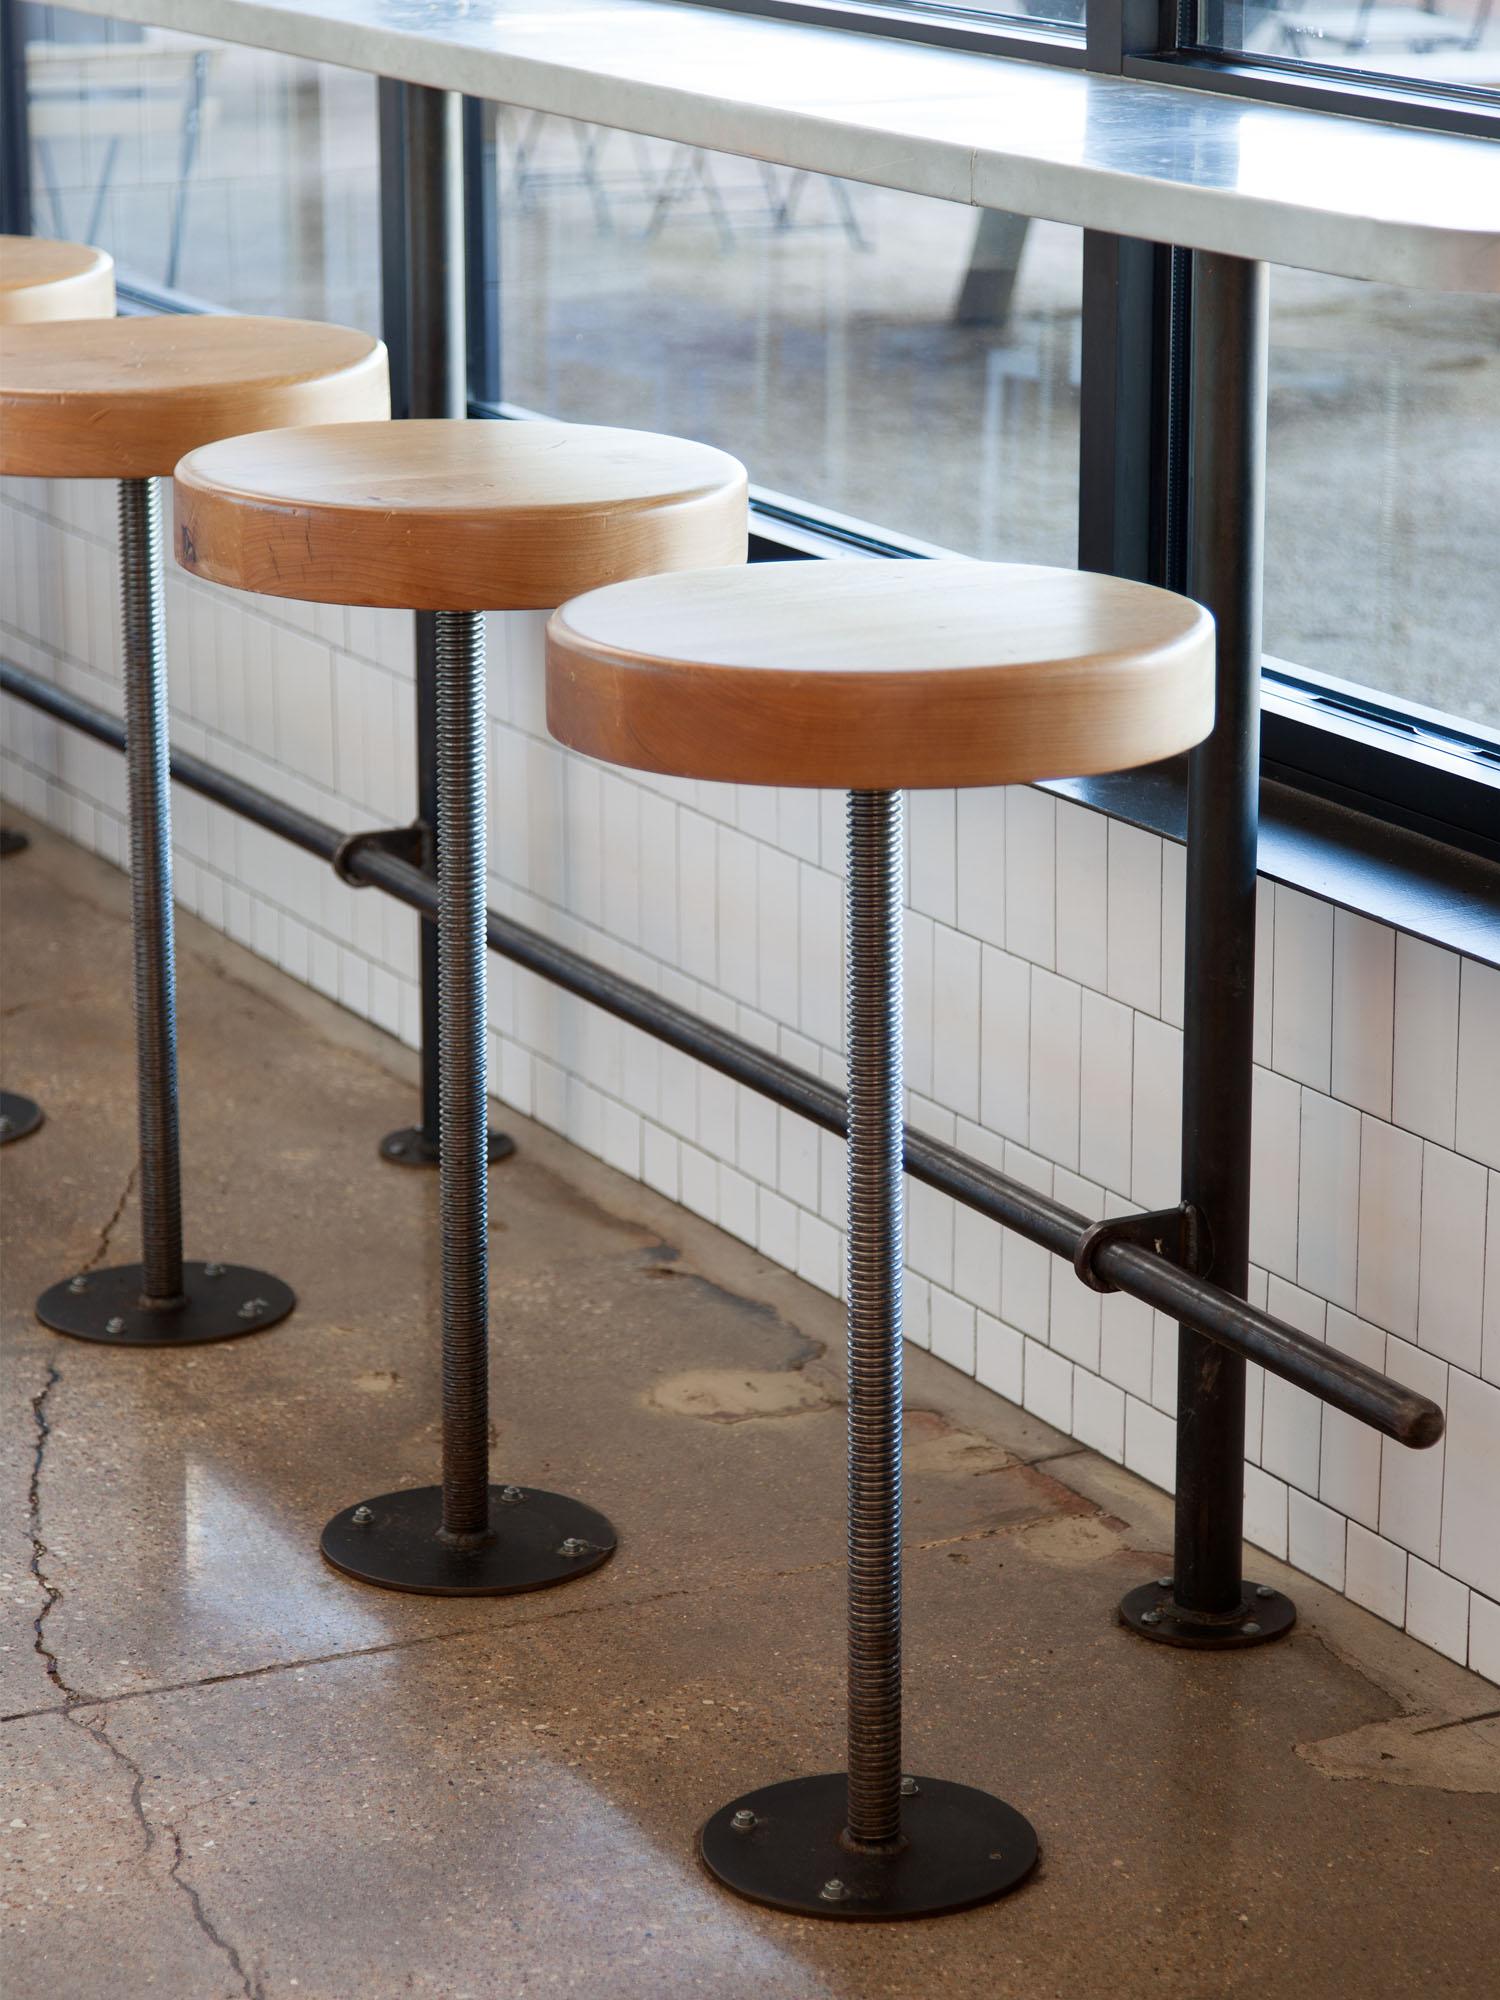 McCray & Co. - St. Philip - Custom Bake Shop Stools